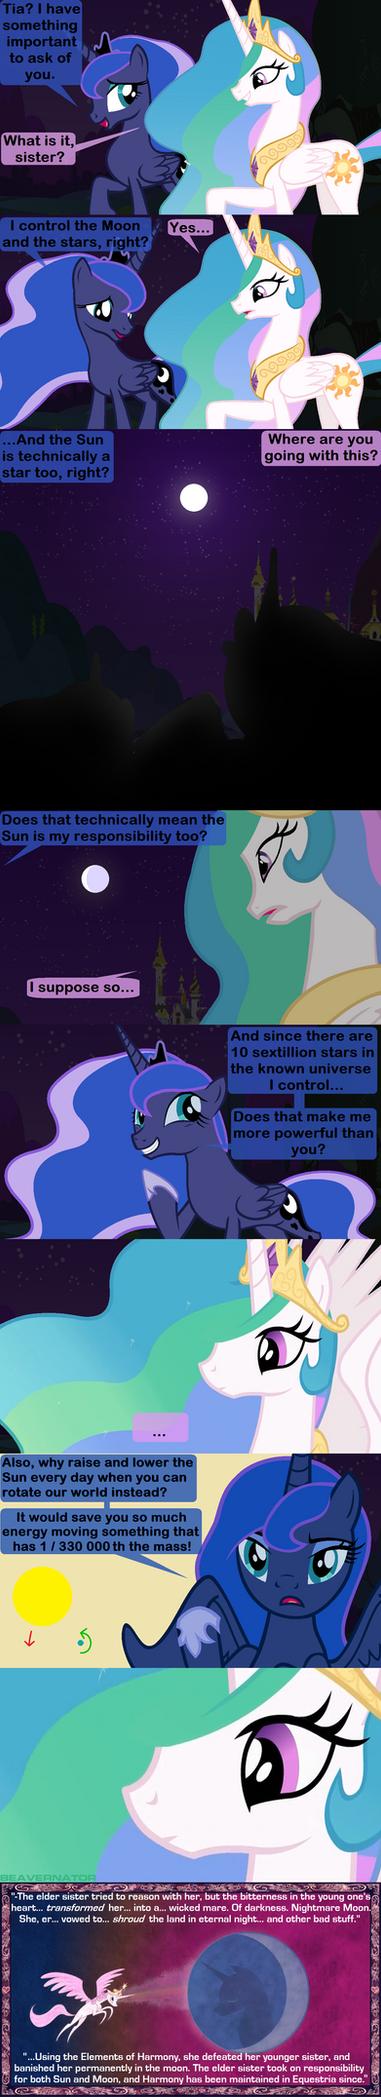 What Really Happened Before Luna's Banishment by Beavernator